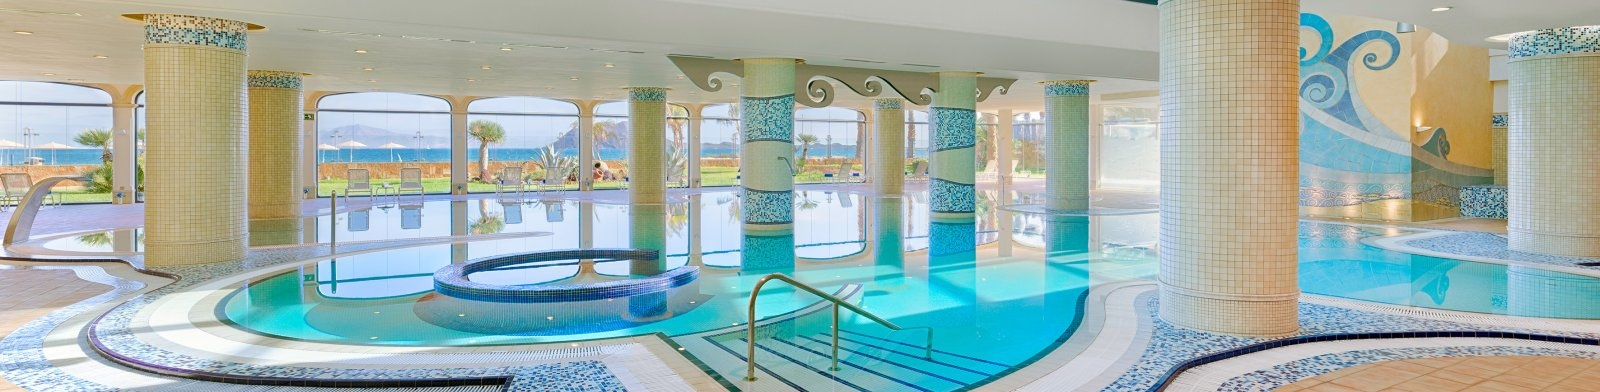 Spa at the Gran Hotel Atlantis Bahia Real